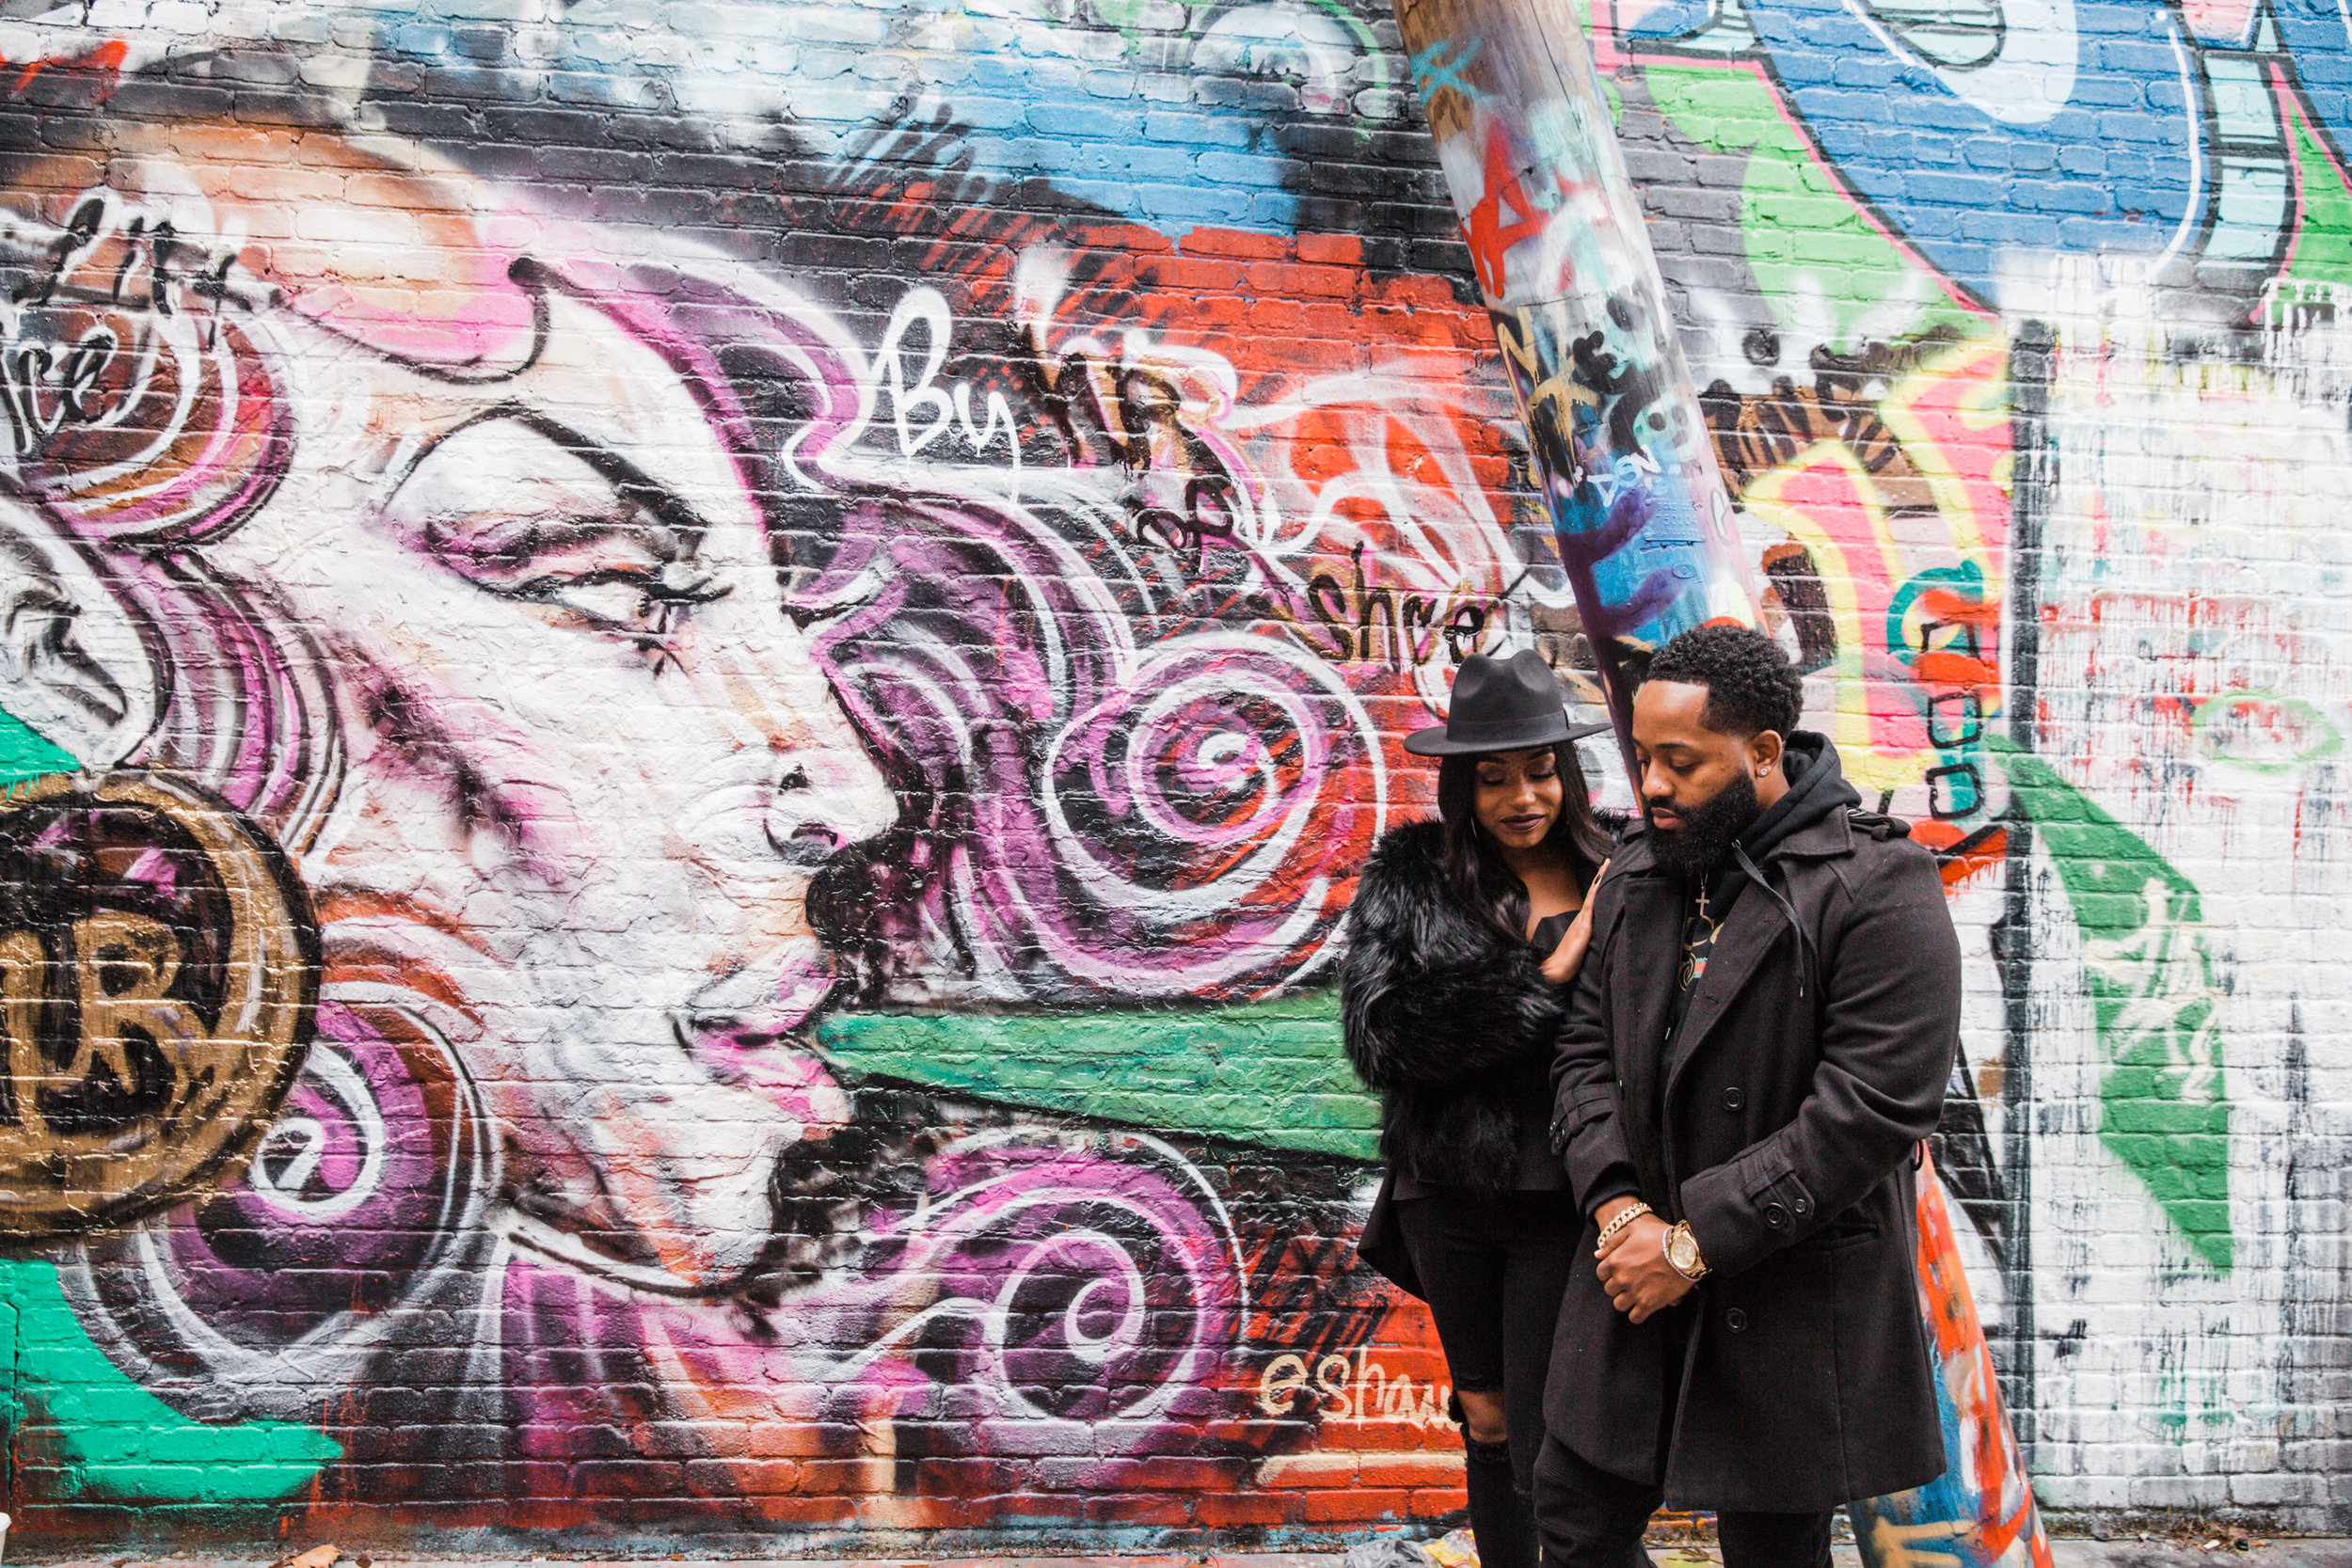 Creative Baltimore Graffiti Alley Engagement Session Megapixels Media Photography-36.jpg